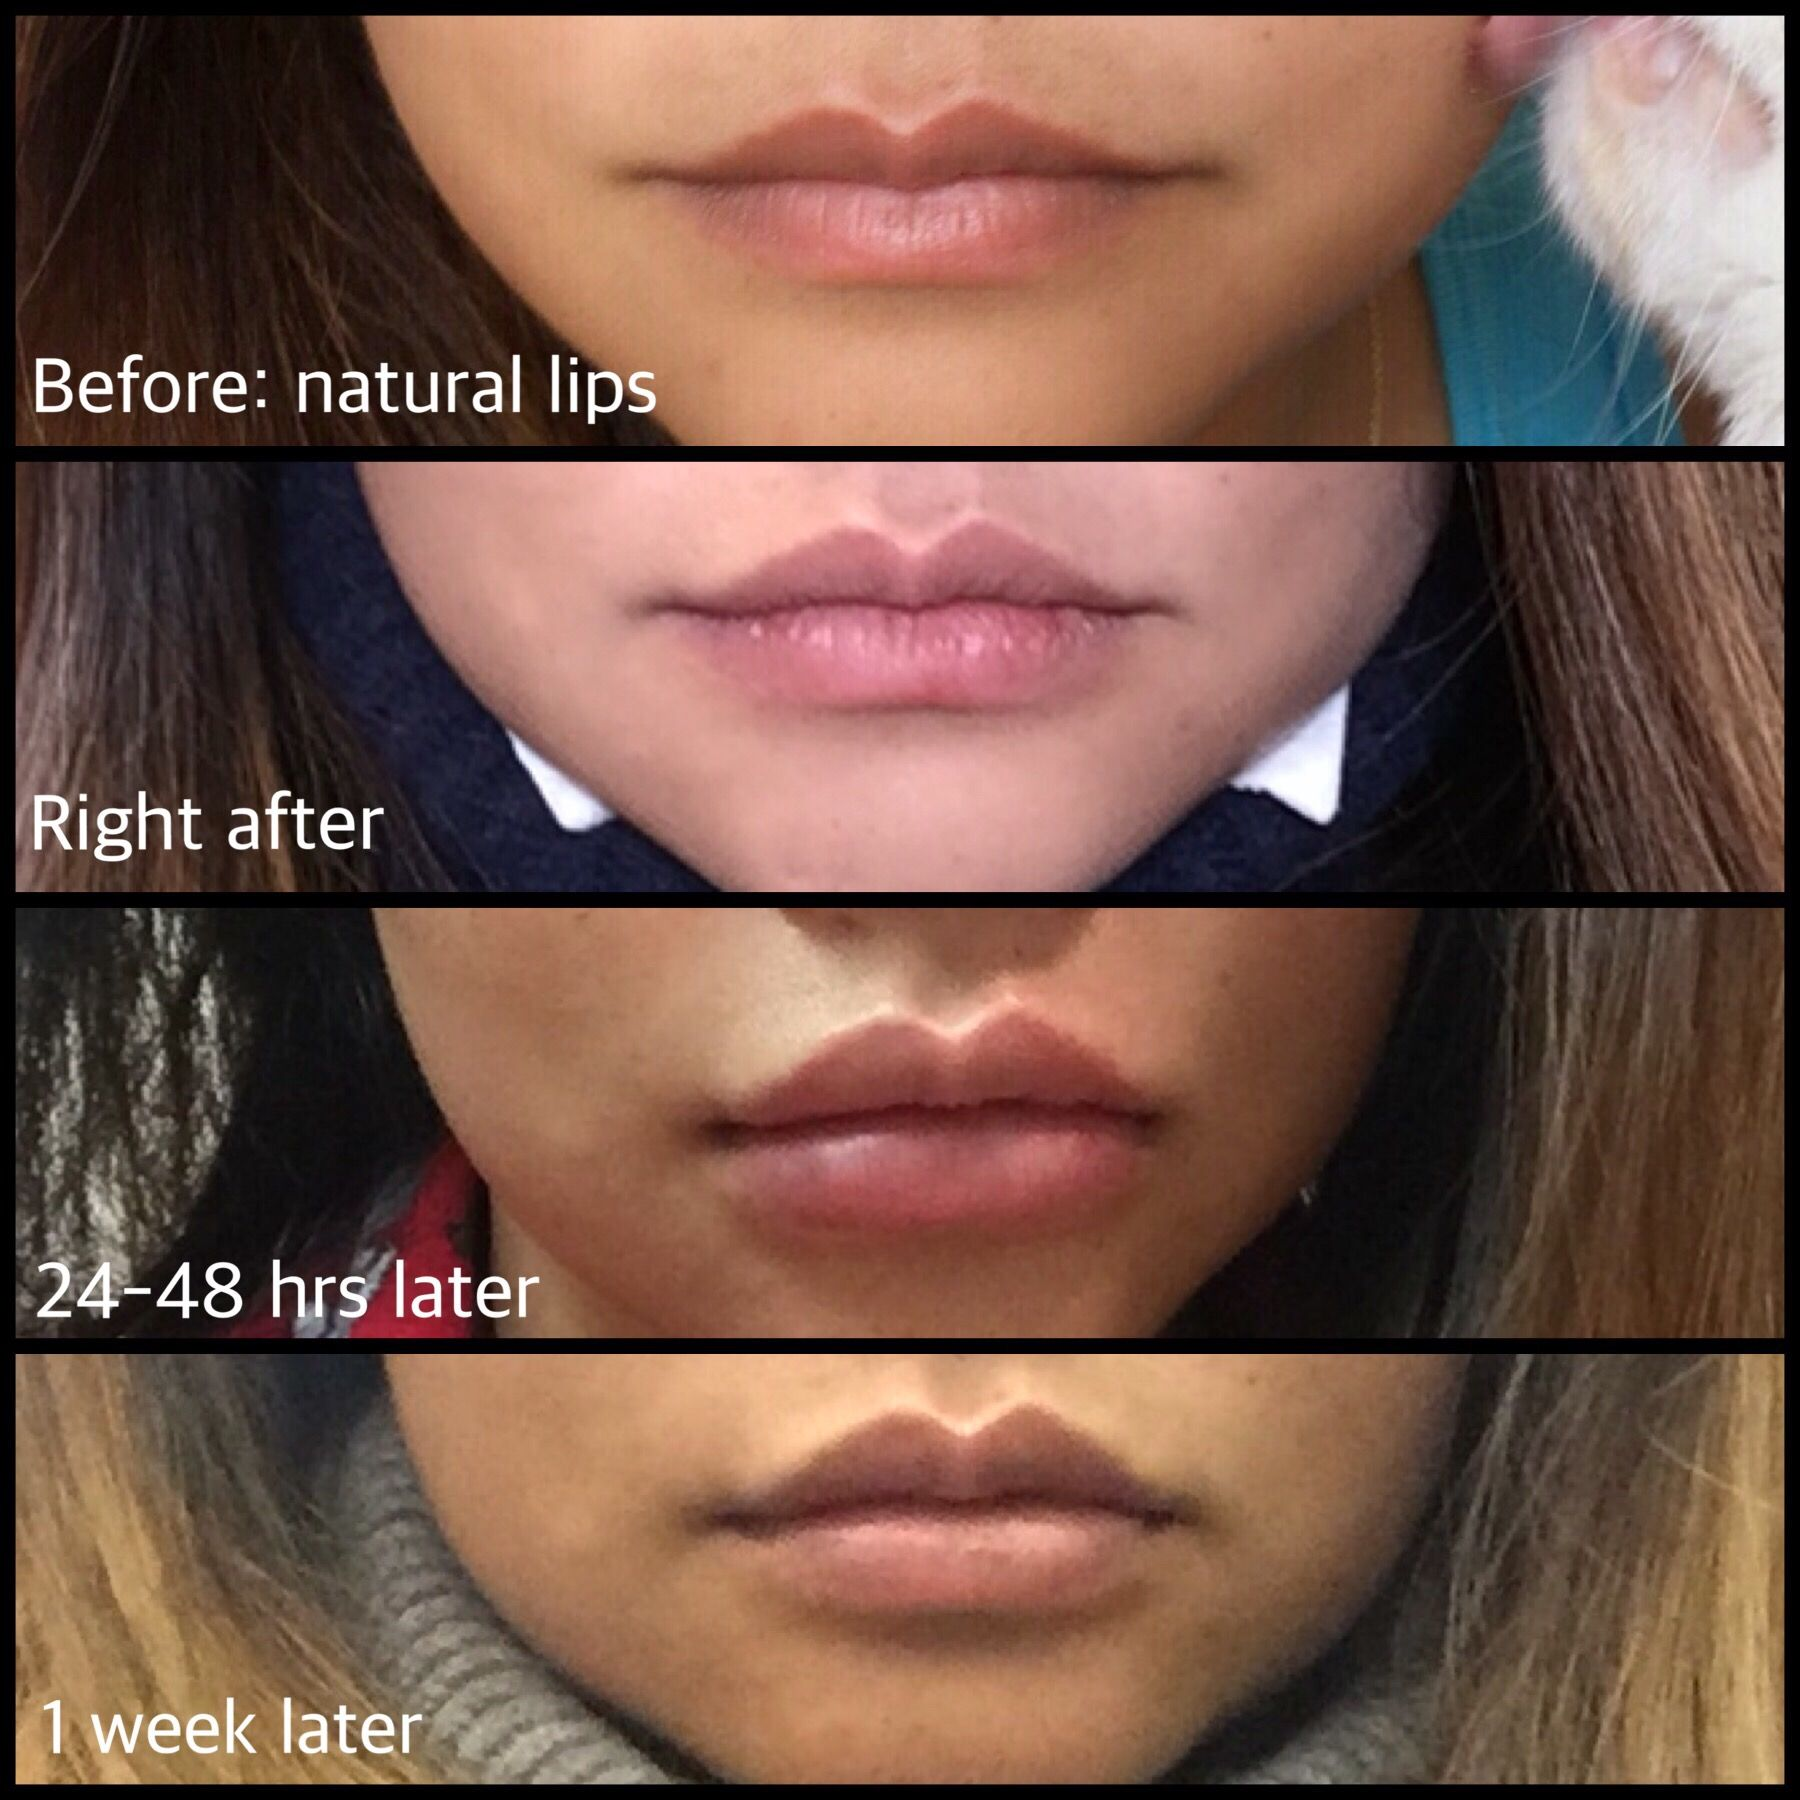 ac7e60a1d51fbfe0bf4ab1717a47c812 - How To Get Swelling To Go Down On Lip